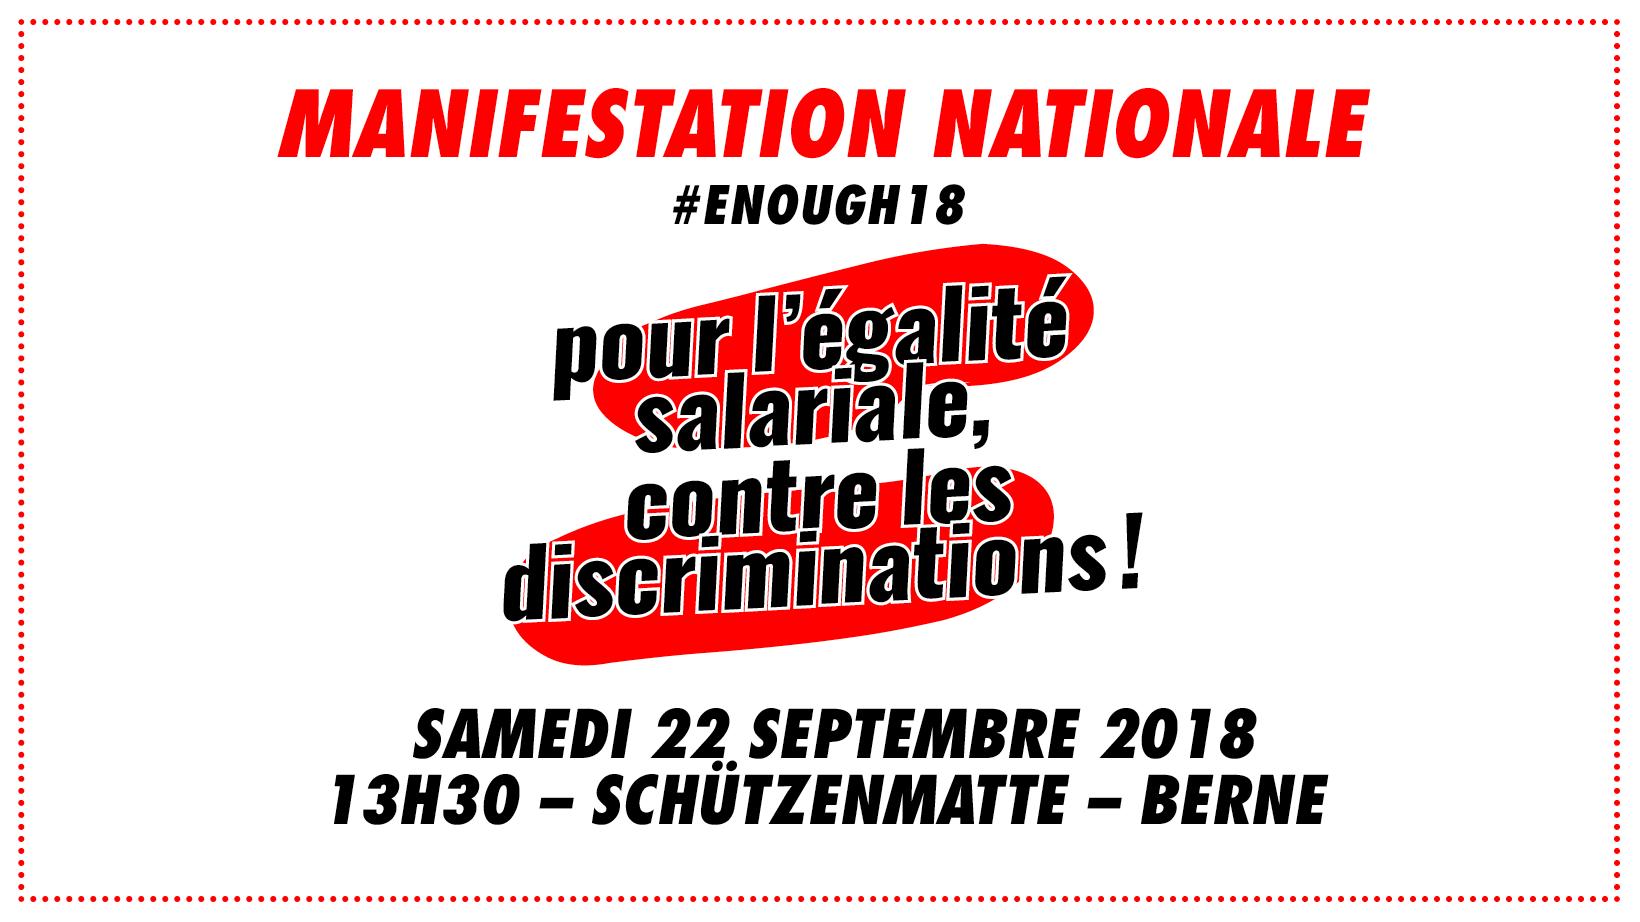 2018 06 egalitesalariale FB event cover1 redone